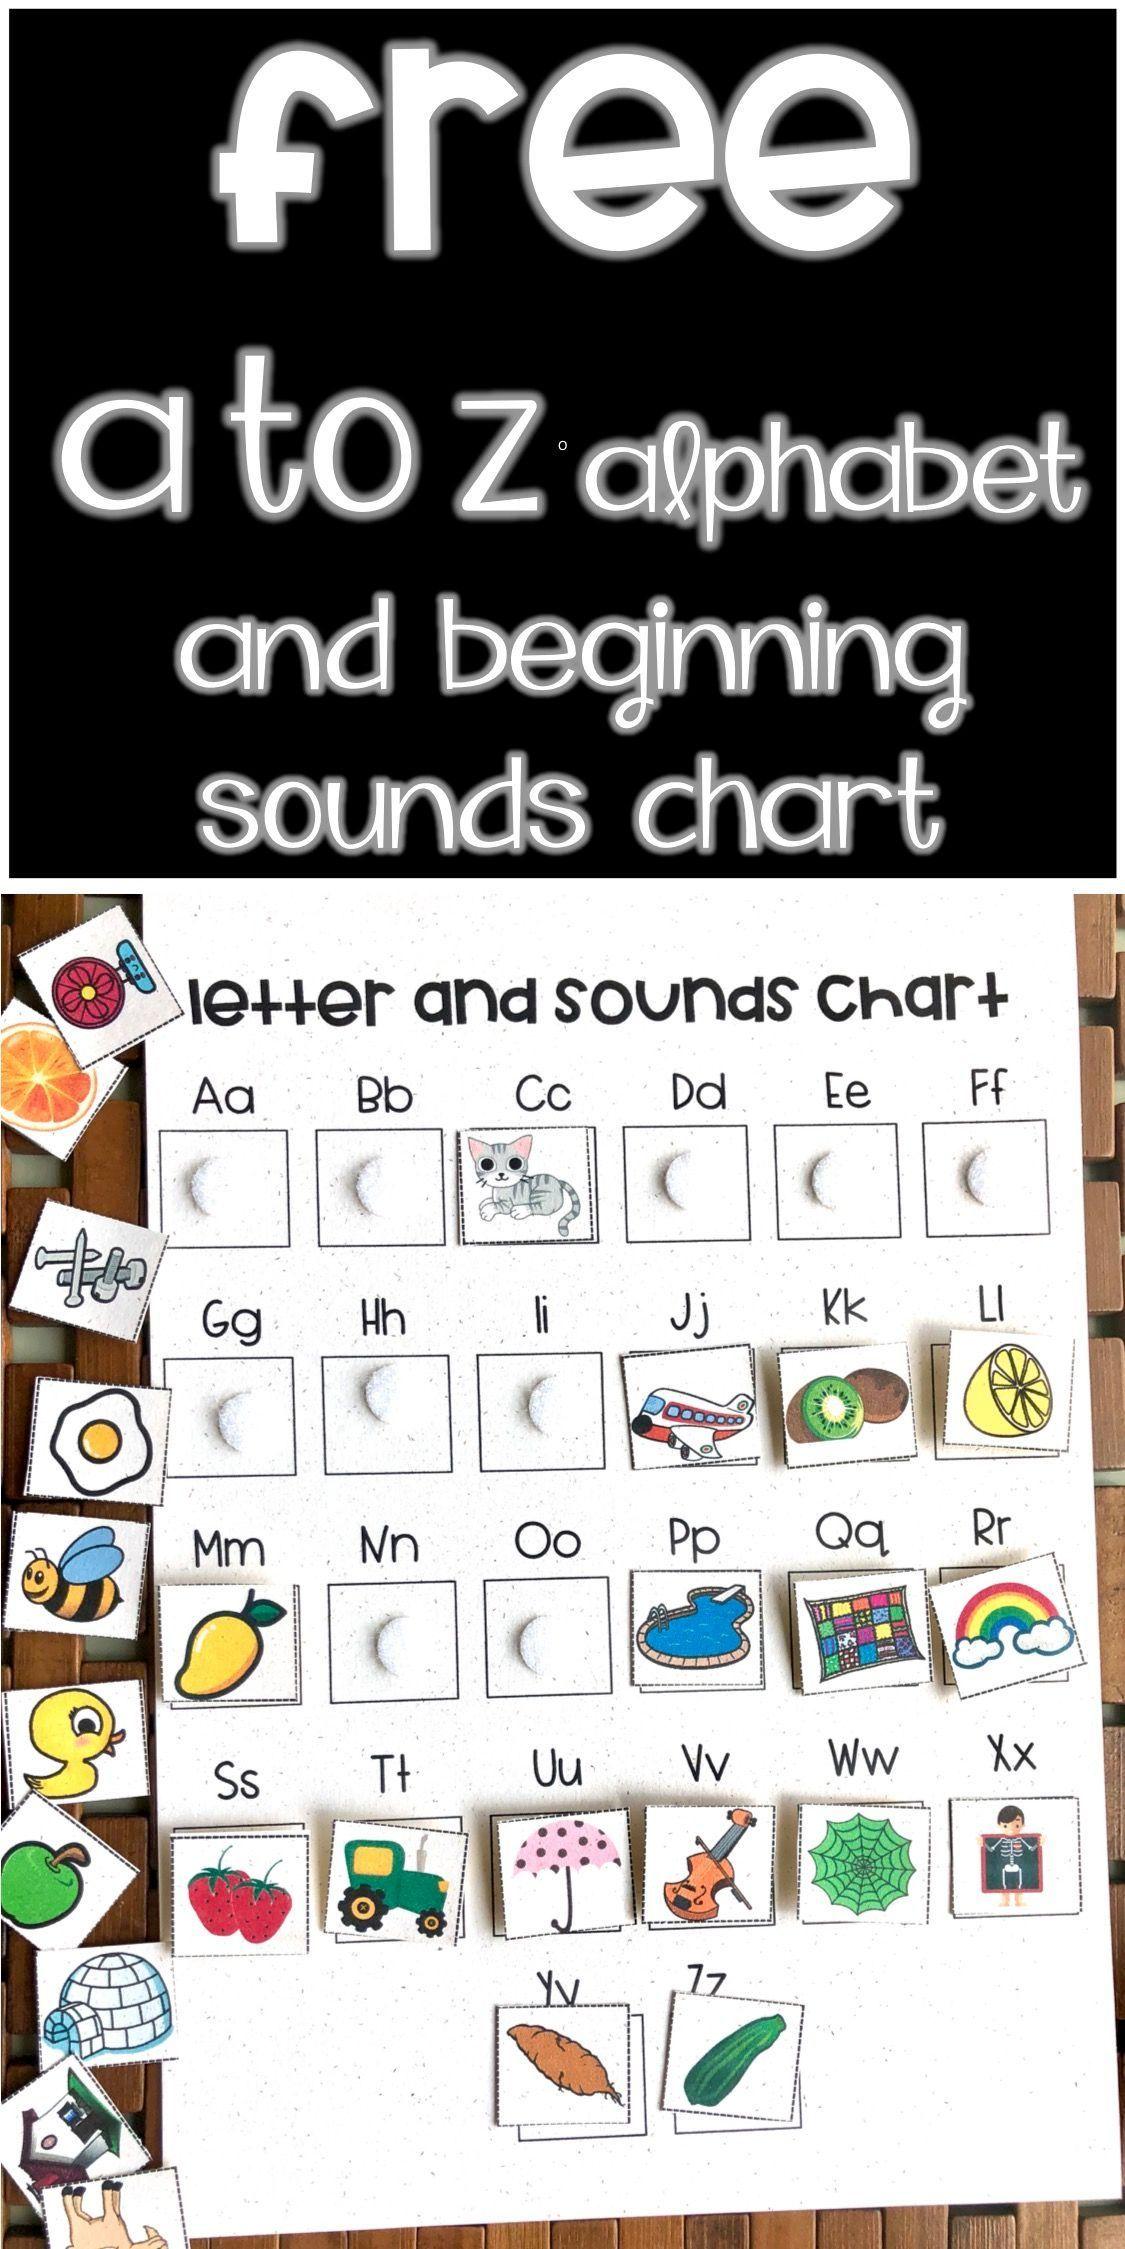 Abc Chart Activity Free Www Worksheetsenglish Com Abc Activities Preschool Abc Chart Letter T Activities [ 2249 x 1125 Pixel ]